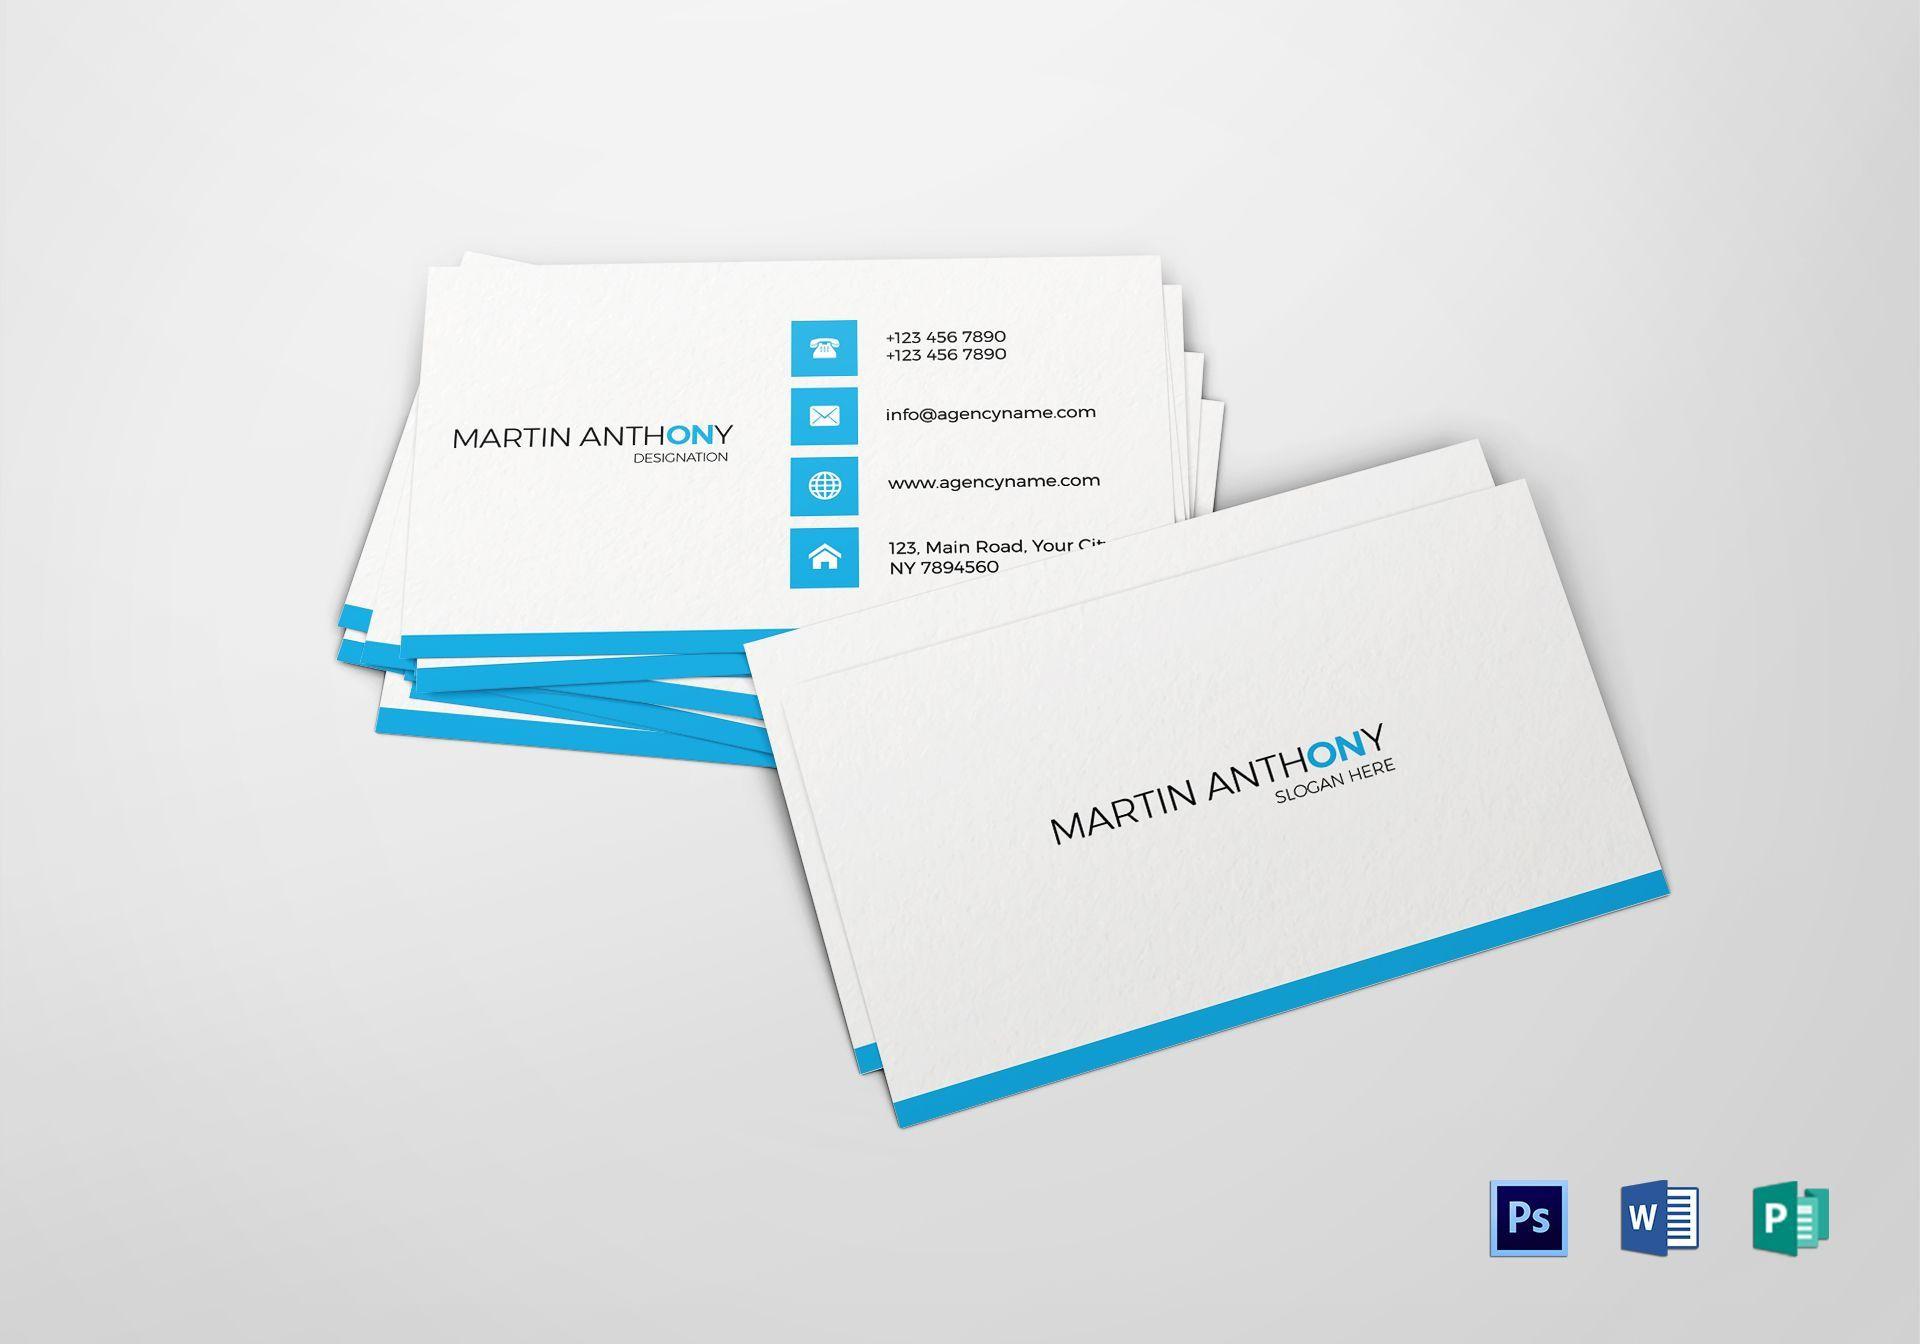 000 Impressive Free Simple Busines Card Template Word High Def Full